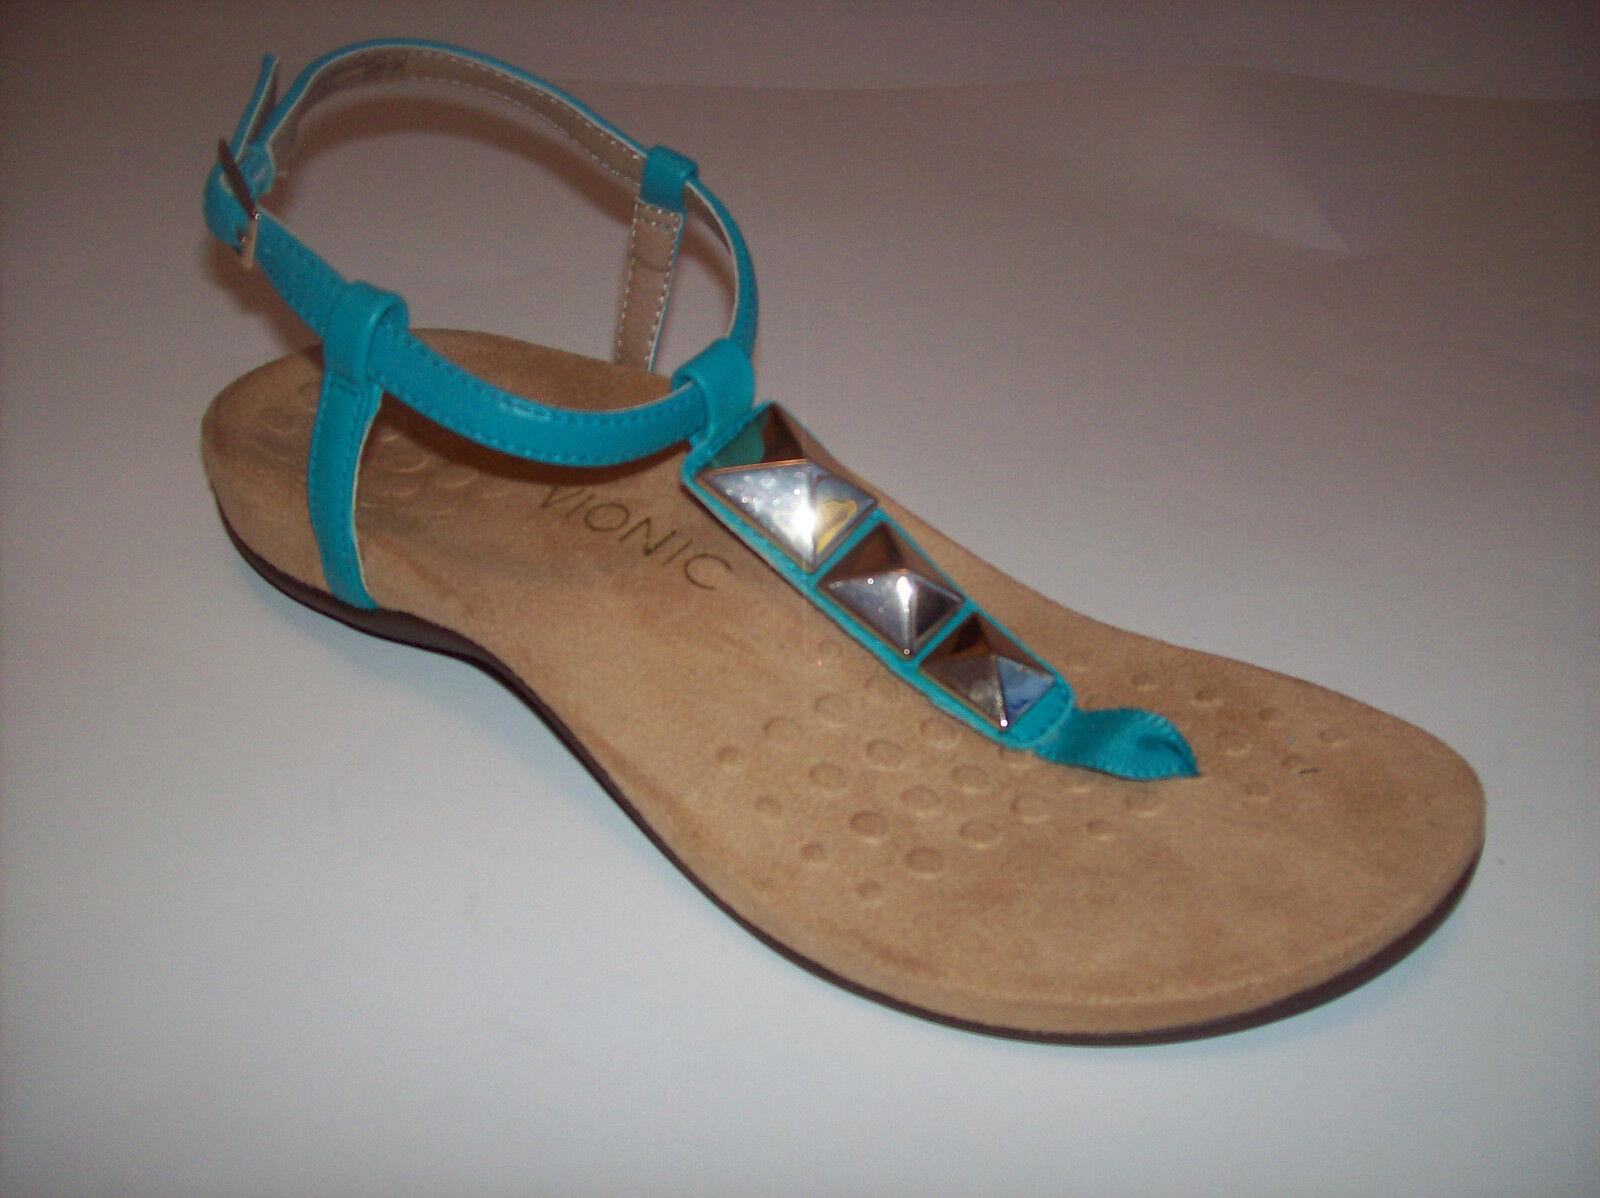 New VIONIC NALA  femmes teal or embellished thong comfort sandals US Sz 8M